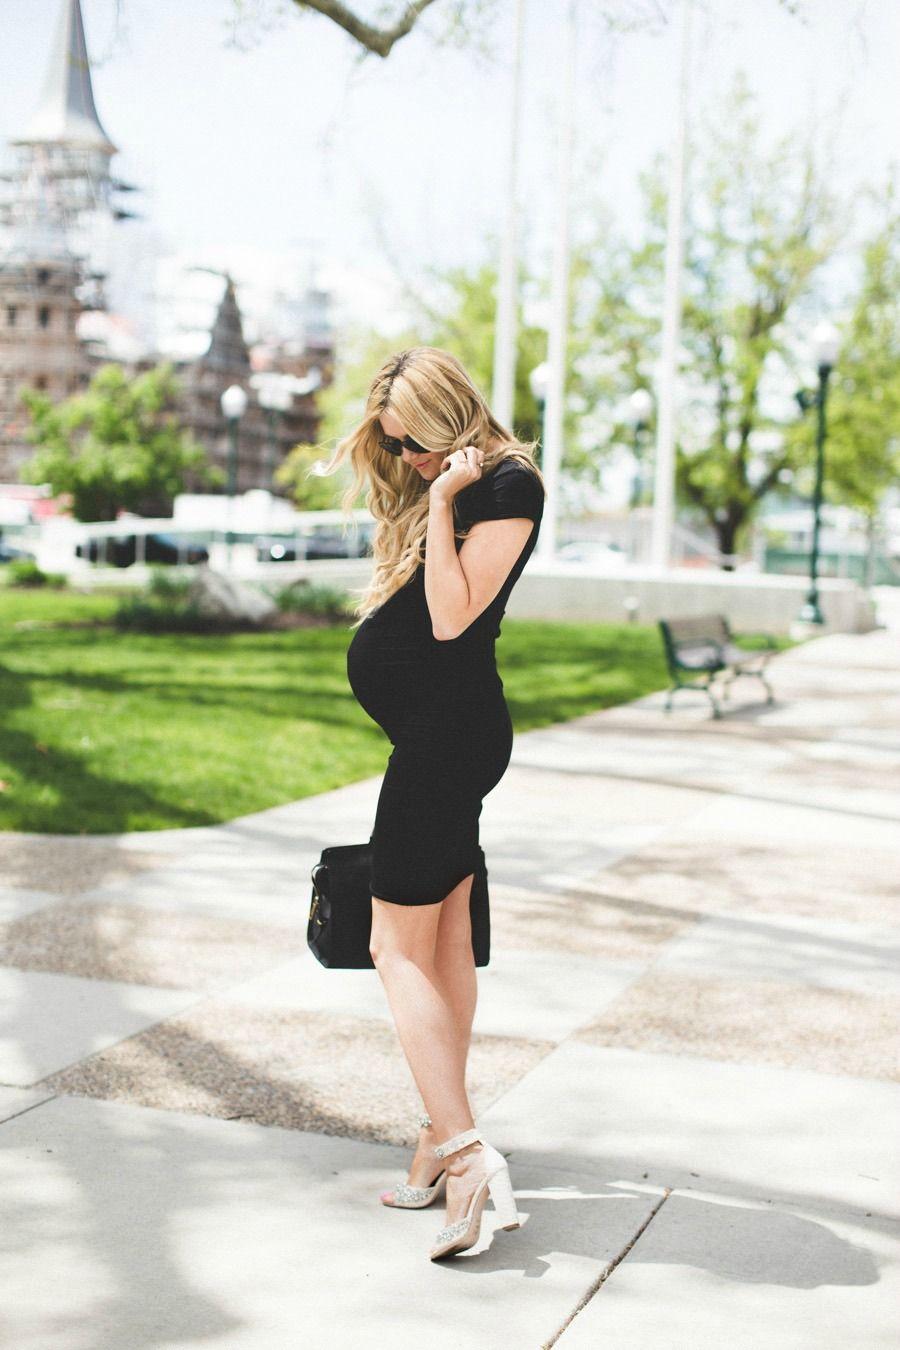 540bd6b03972b Little Black Dress Barefoot Blonde by Amber Fillerup Clark #poshmama # pregnancy #mom #baby #maternity #fashion #style #womensfashion